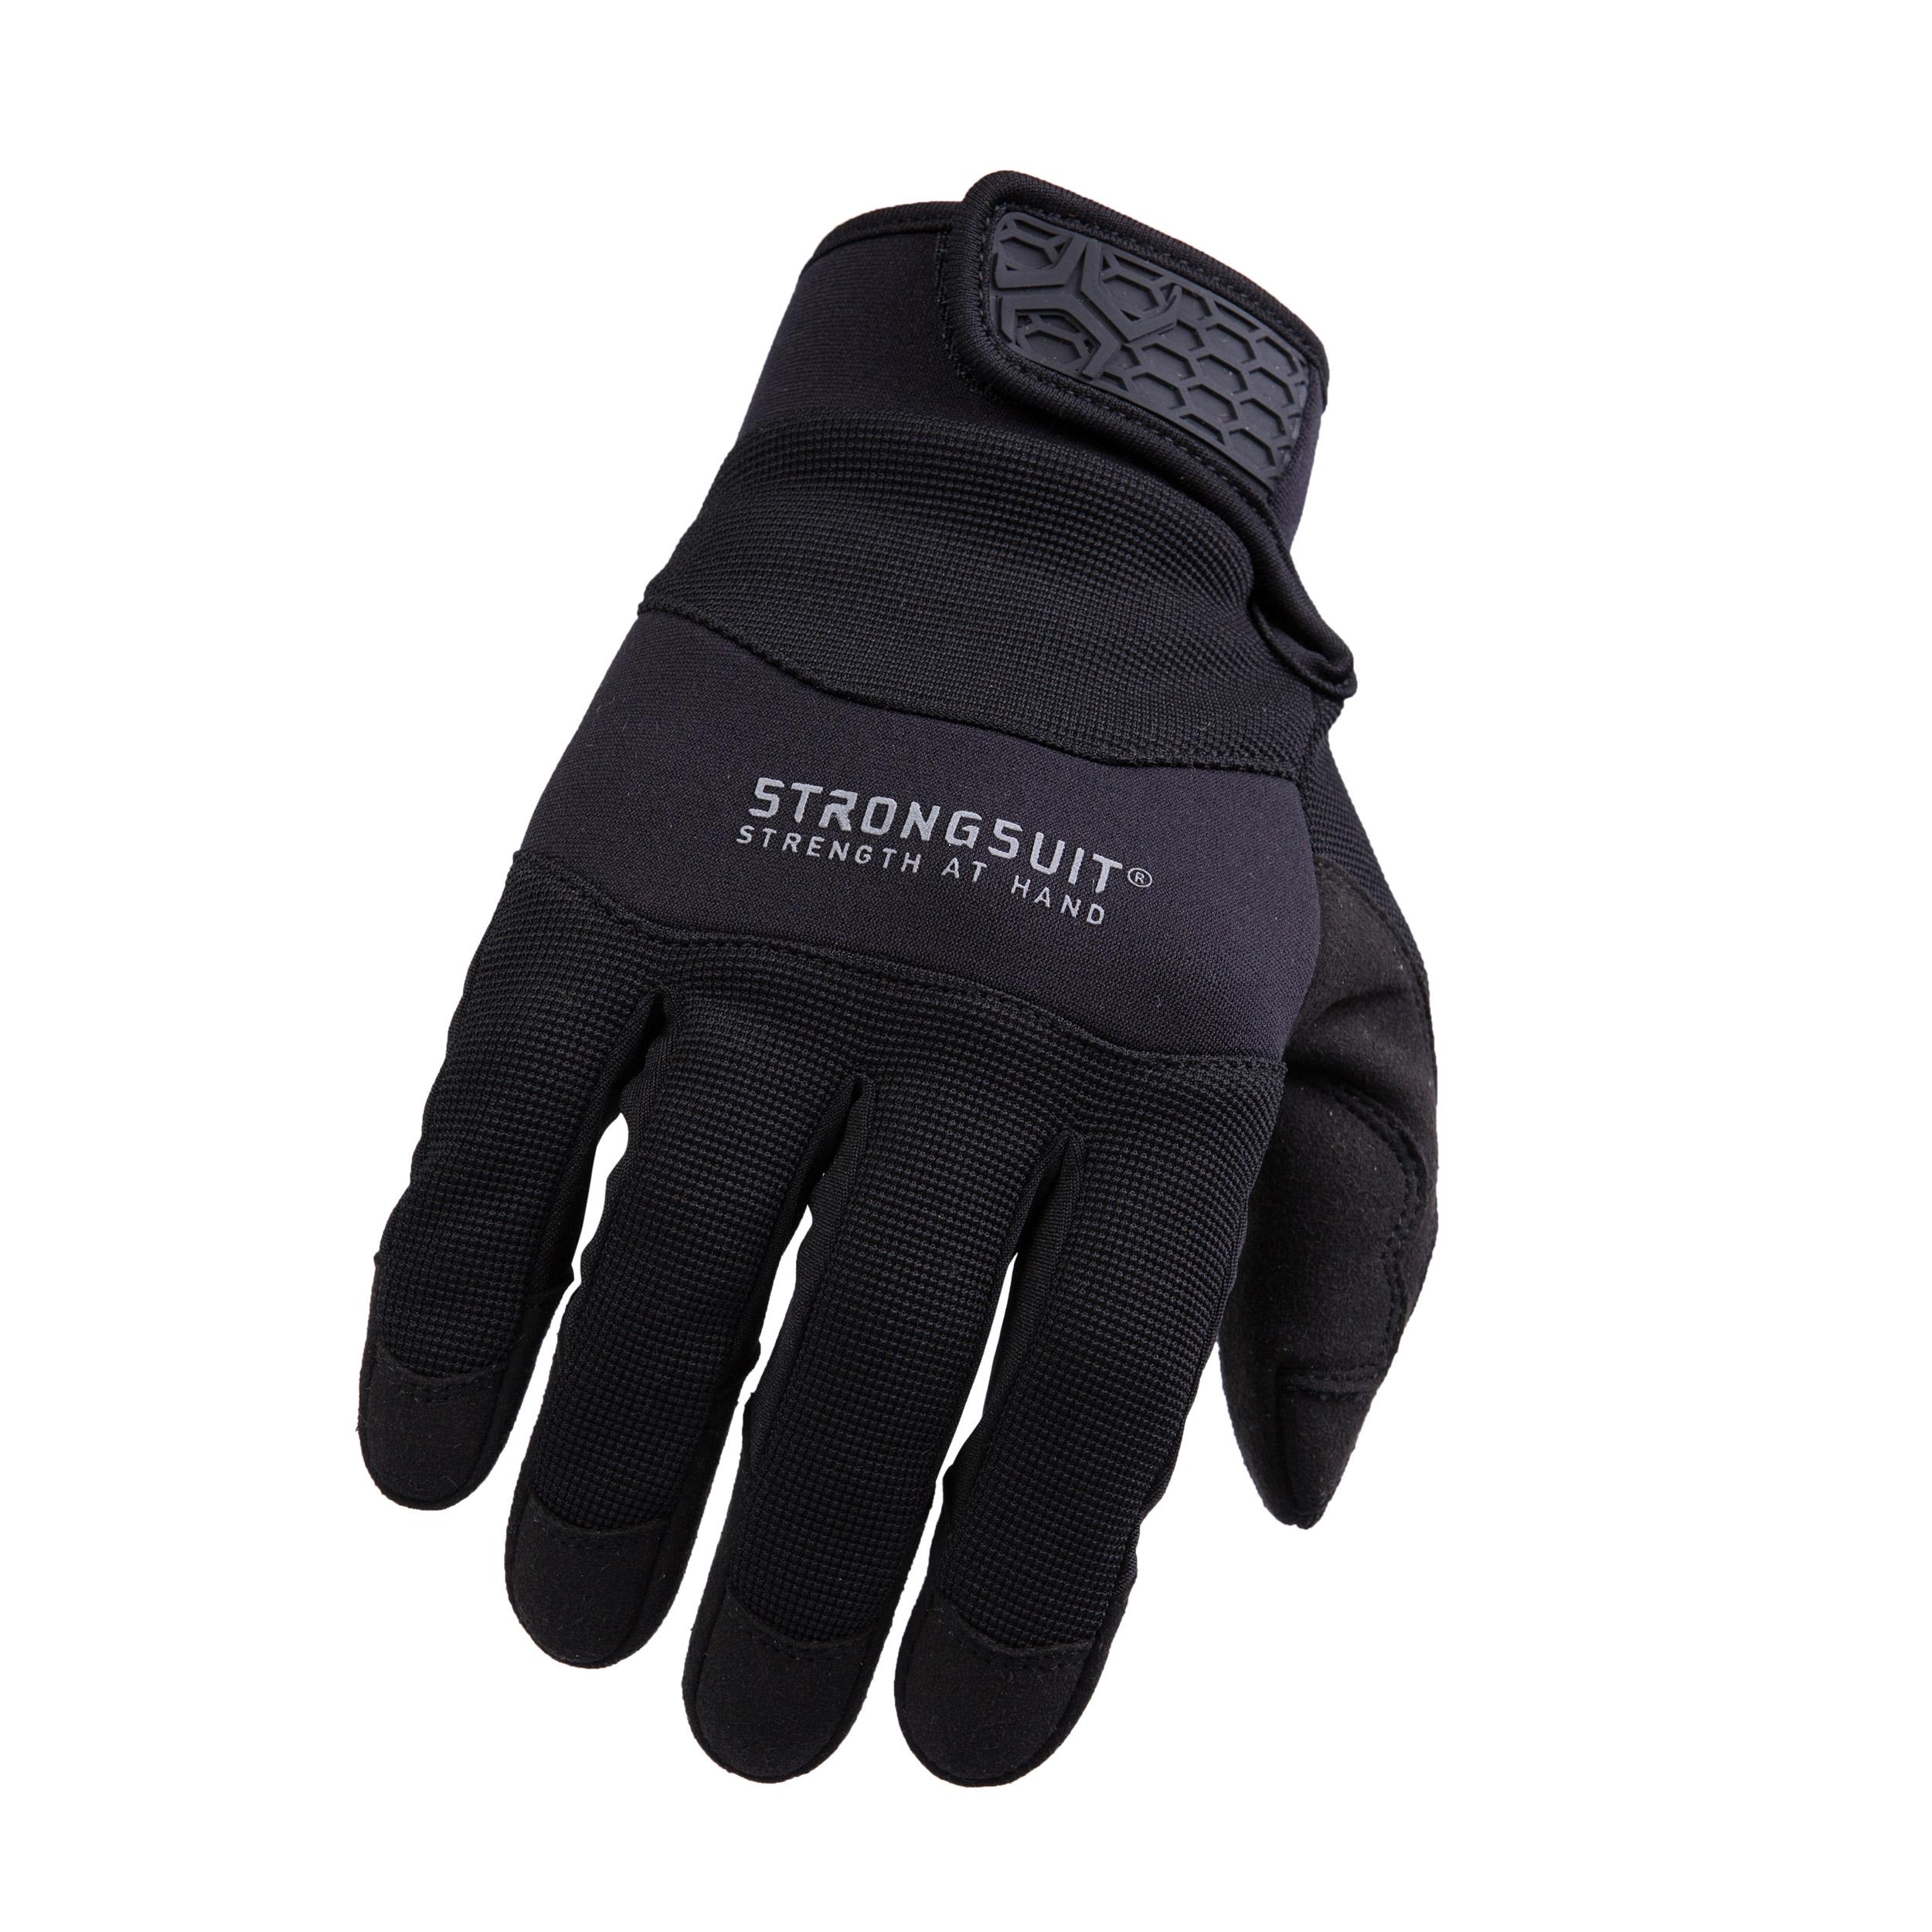 Armor3 Gloves, XL